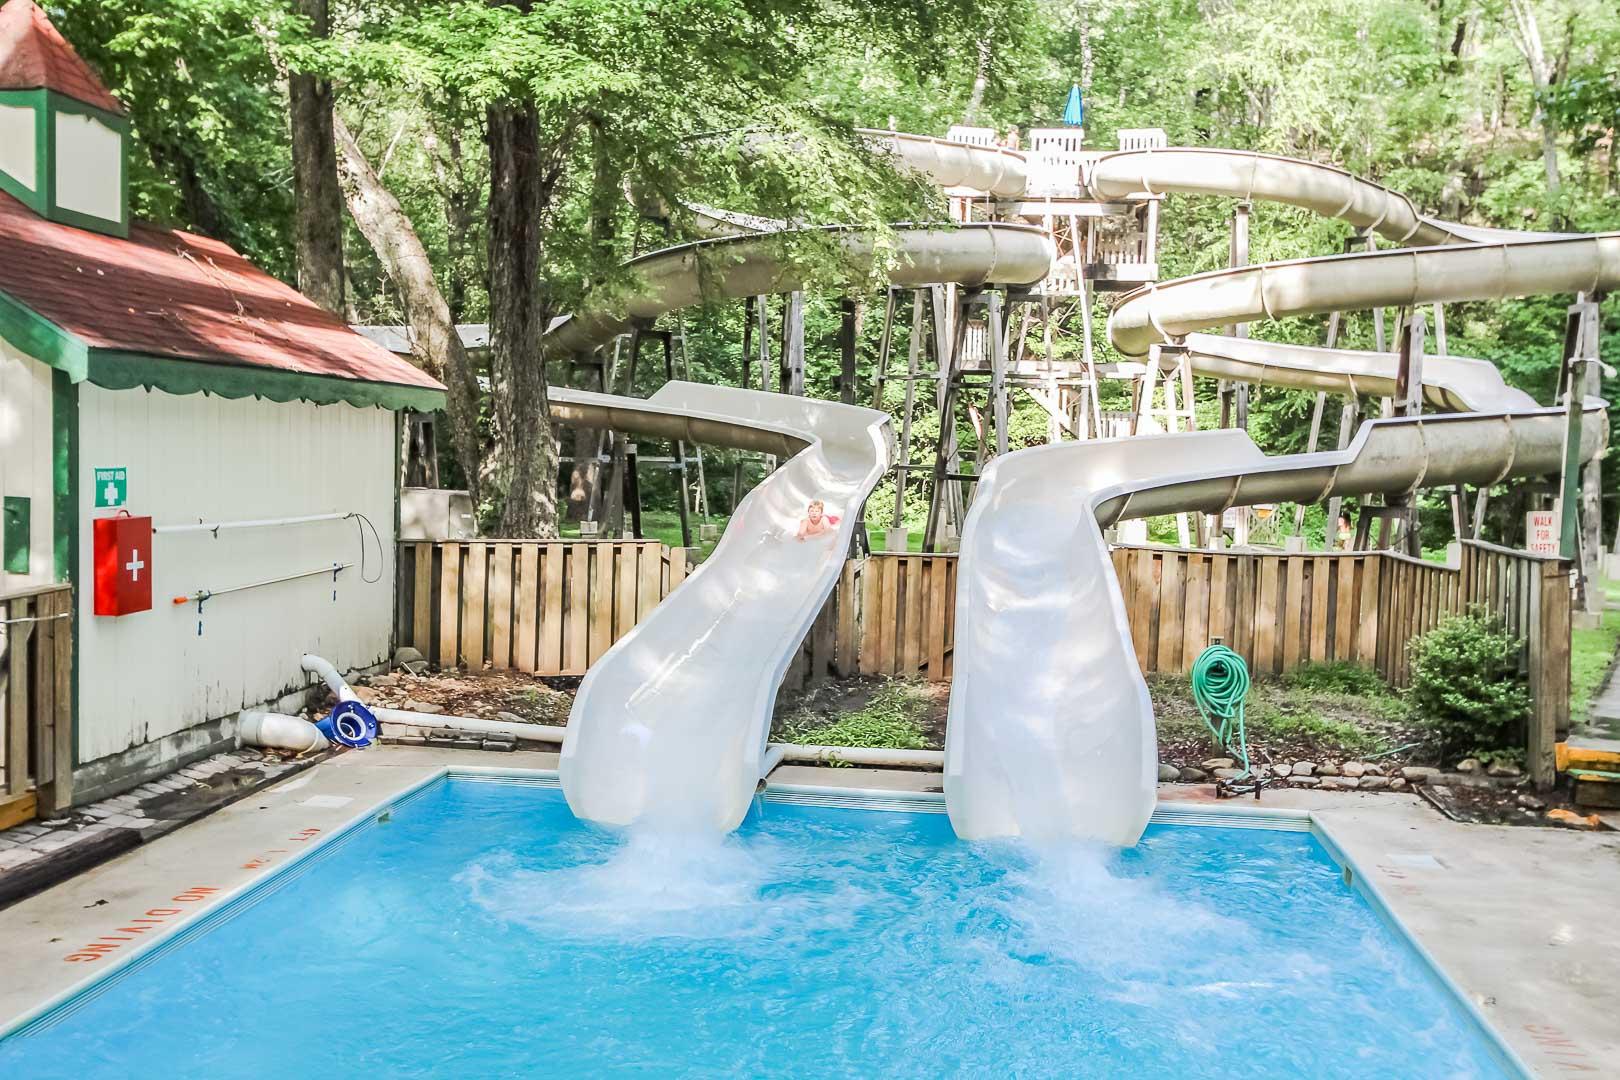 An enjoyable water slide at VRI's Alpine Crest Resort in Georgia.